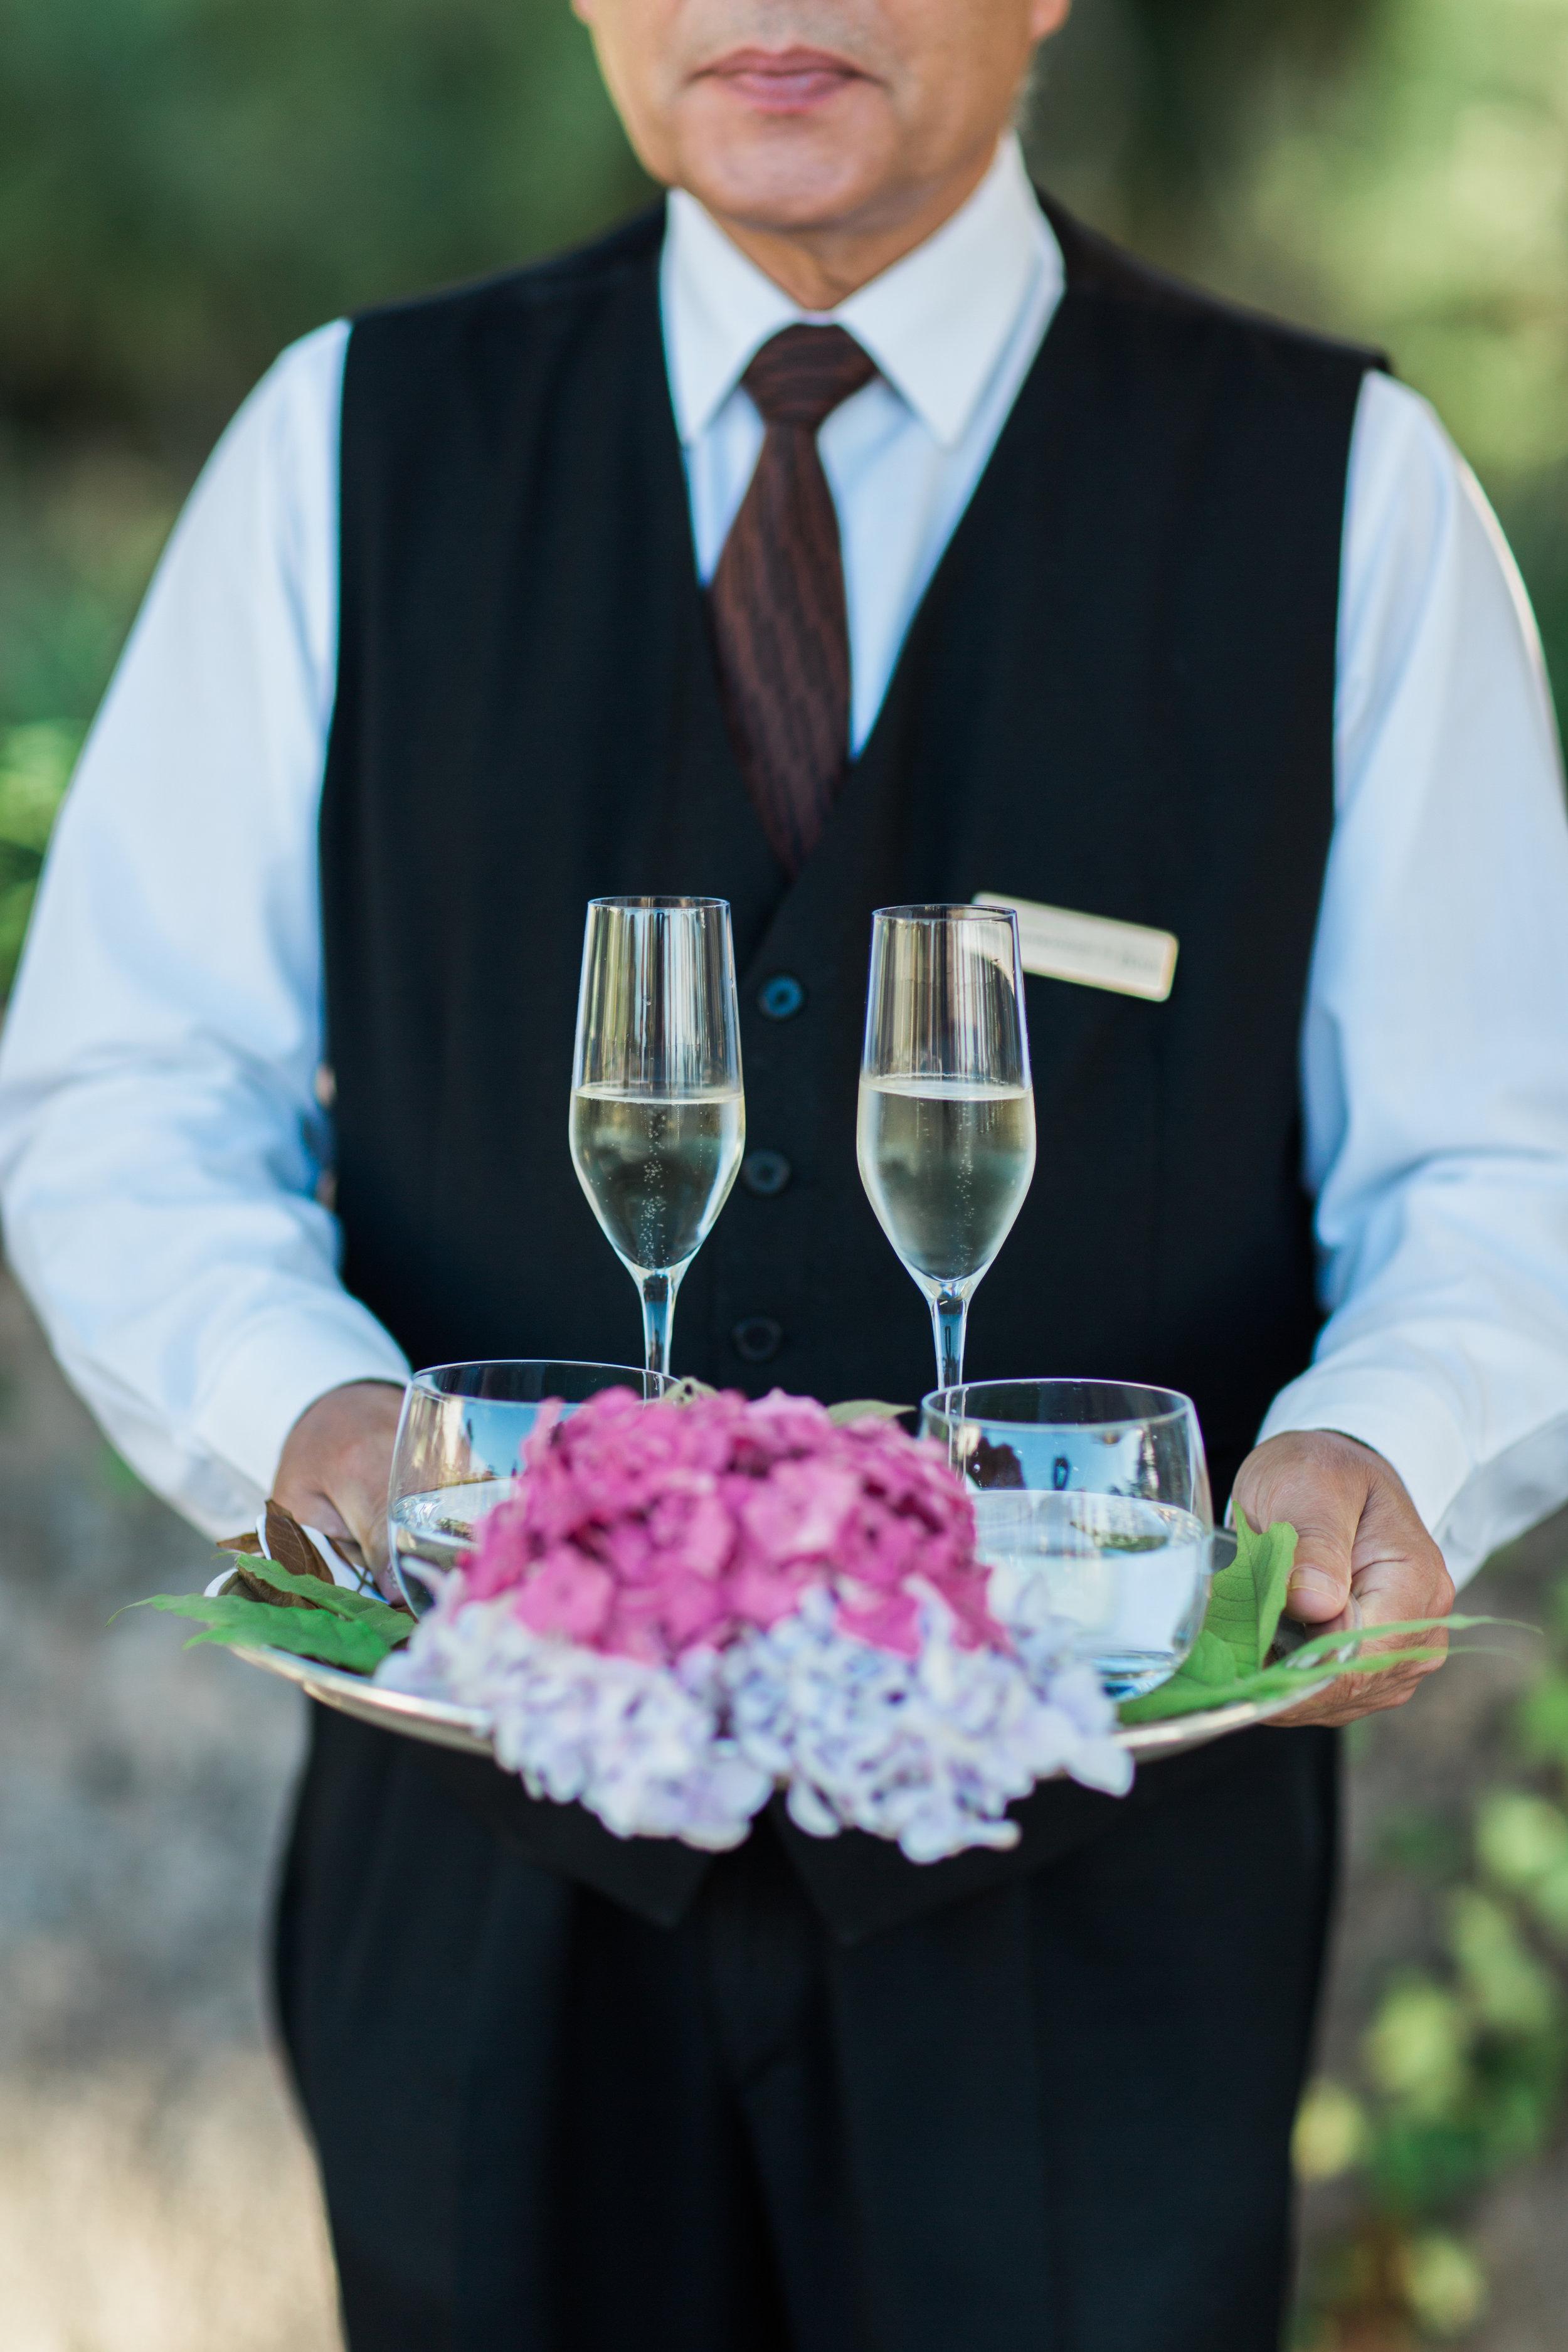 30 mariarao-wedding-palacio-seteais-161.jpg